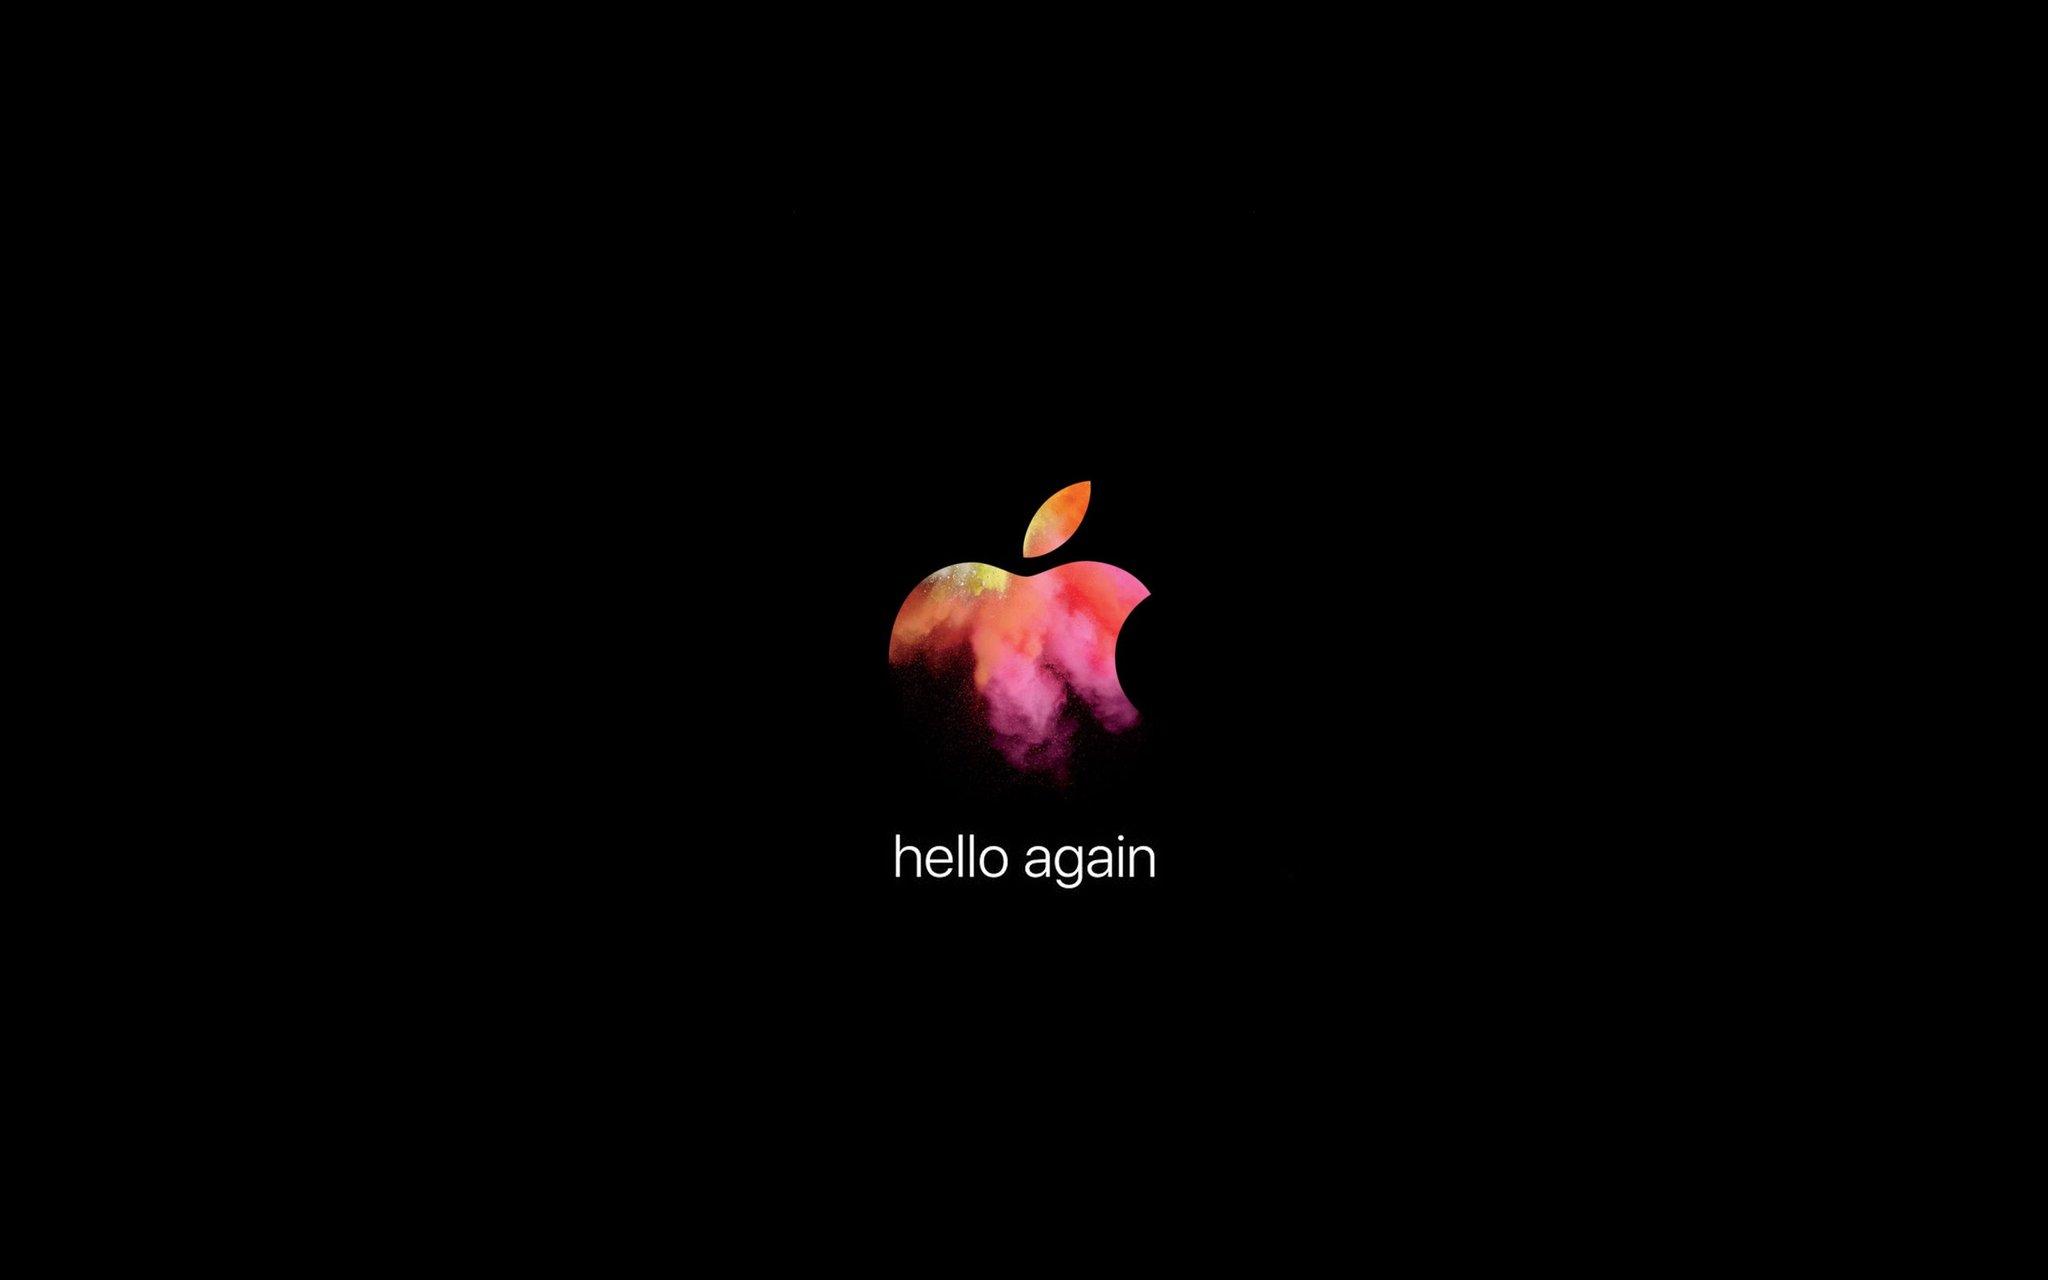 TheScottyQ_Apple October 27 Event desktop hello again